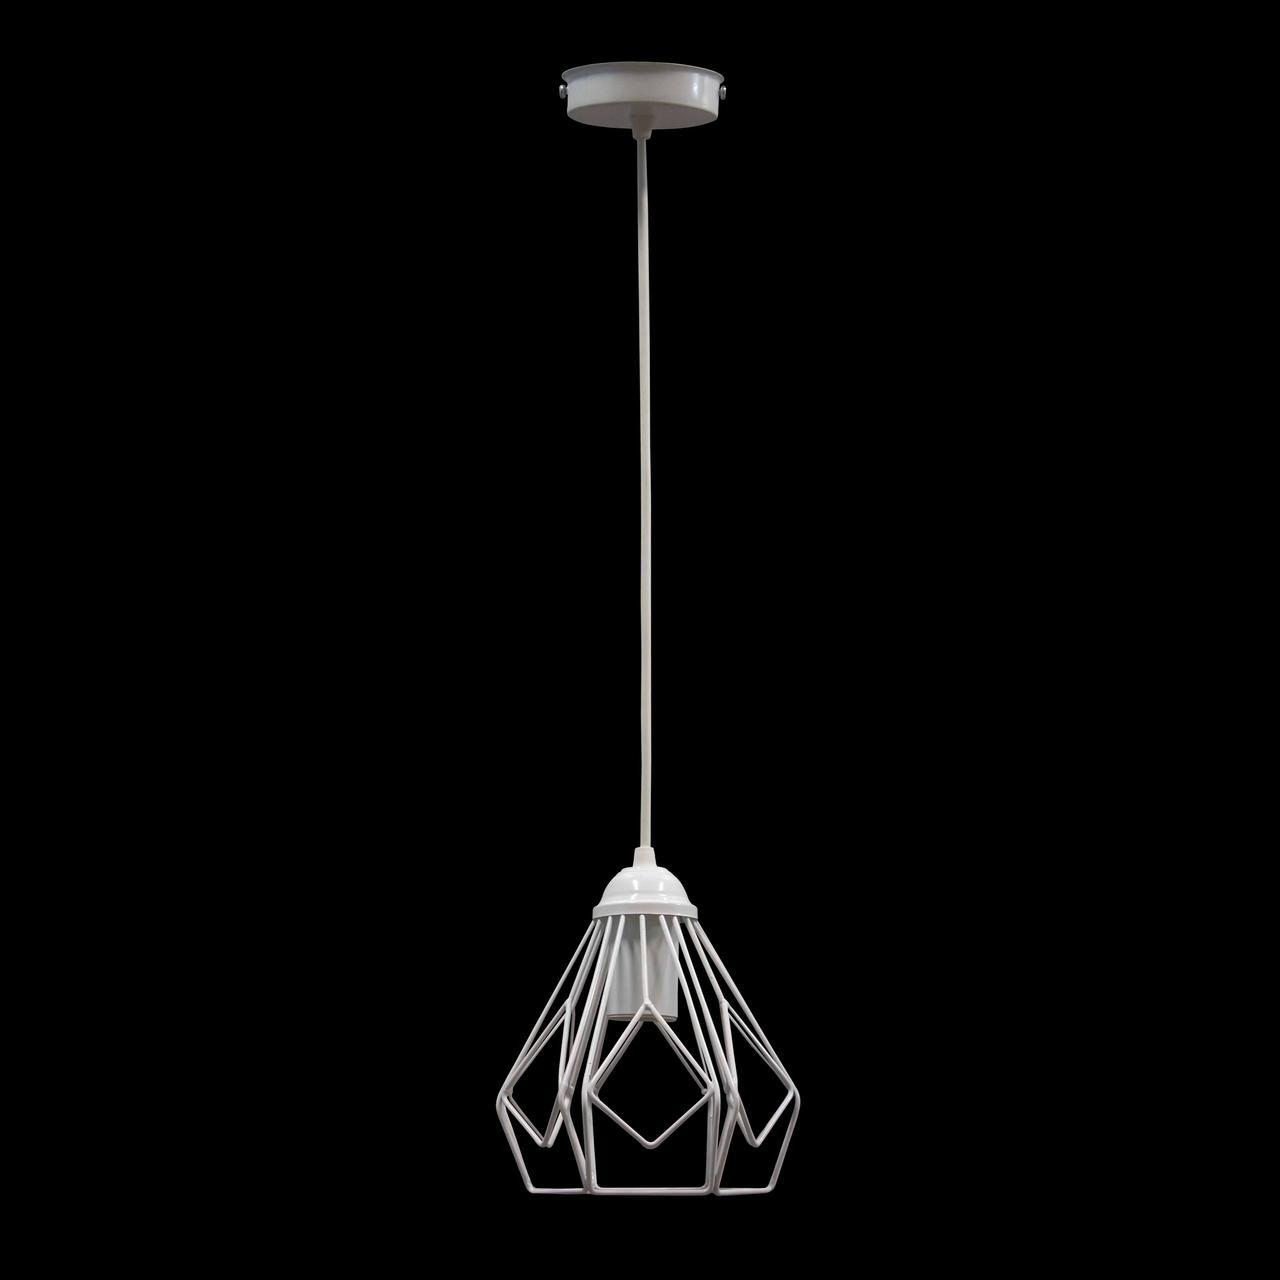 Светильник подвесной в стиле лофт NL 538 W MSK Electric